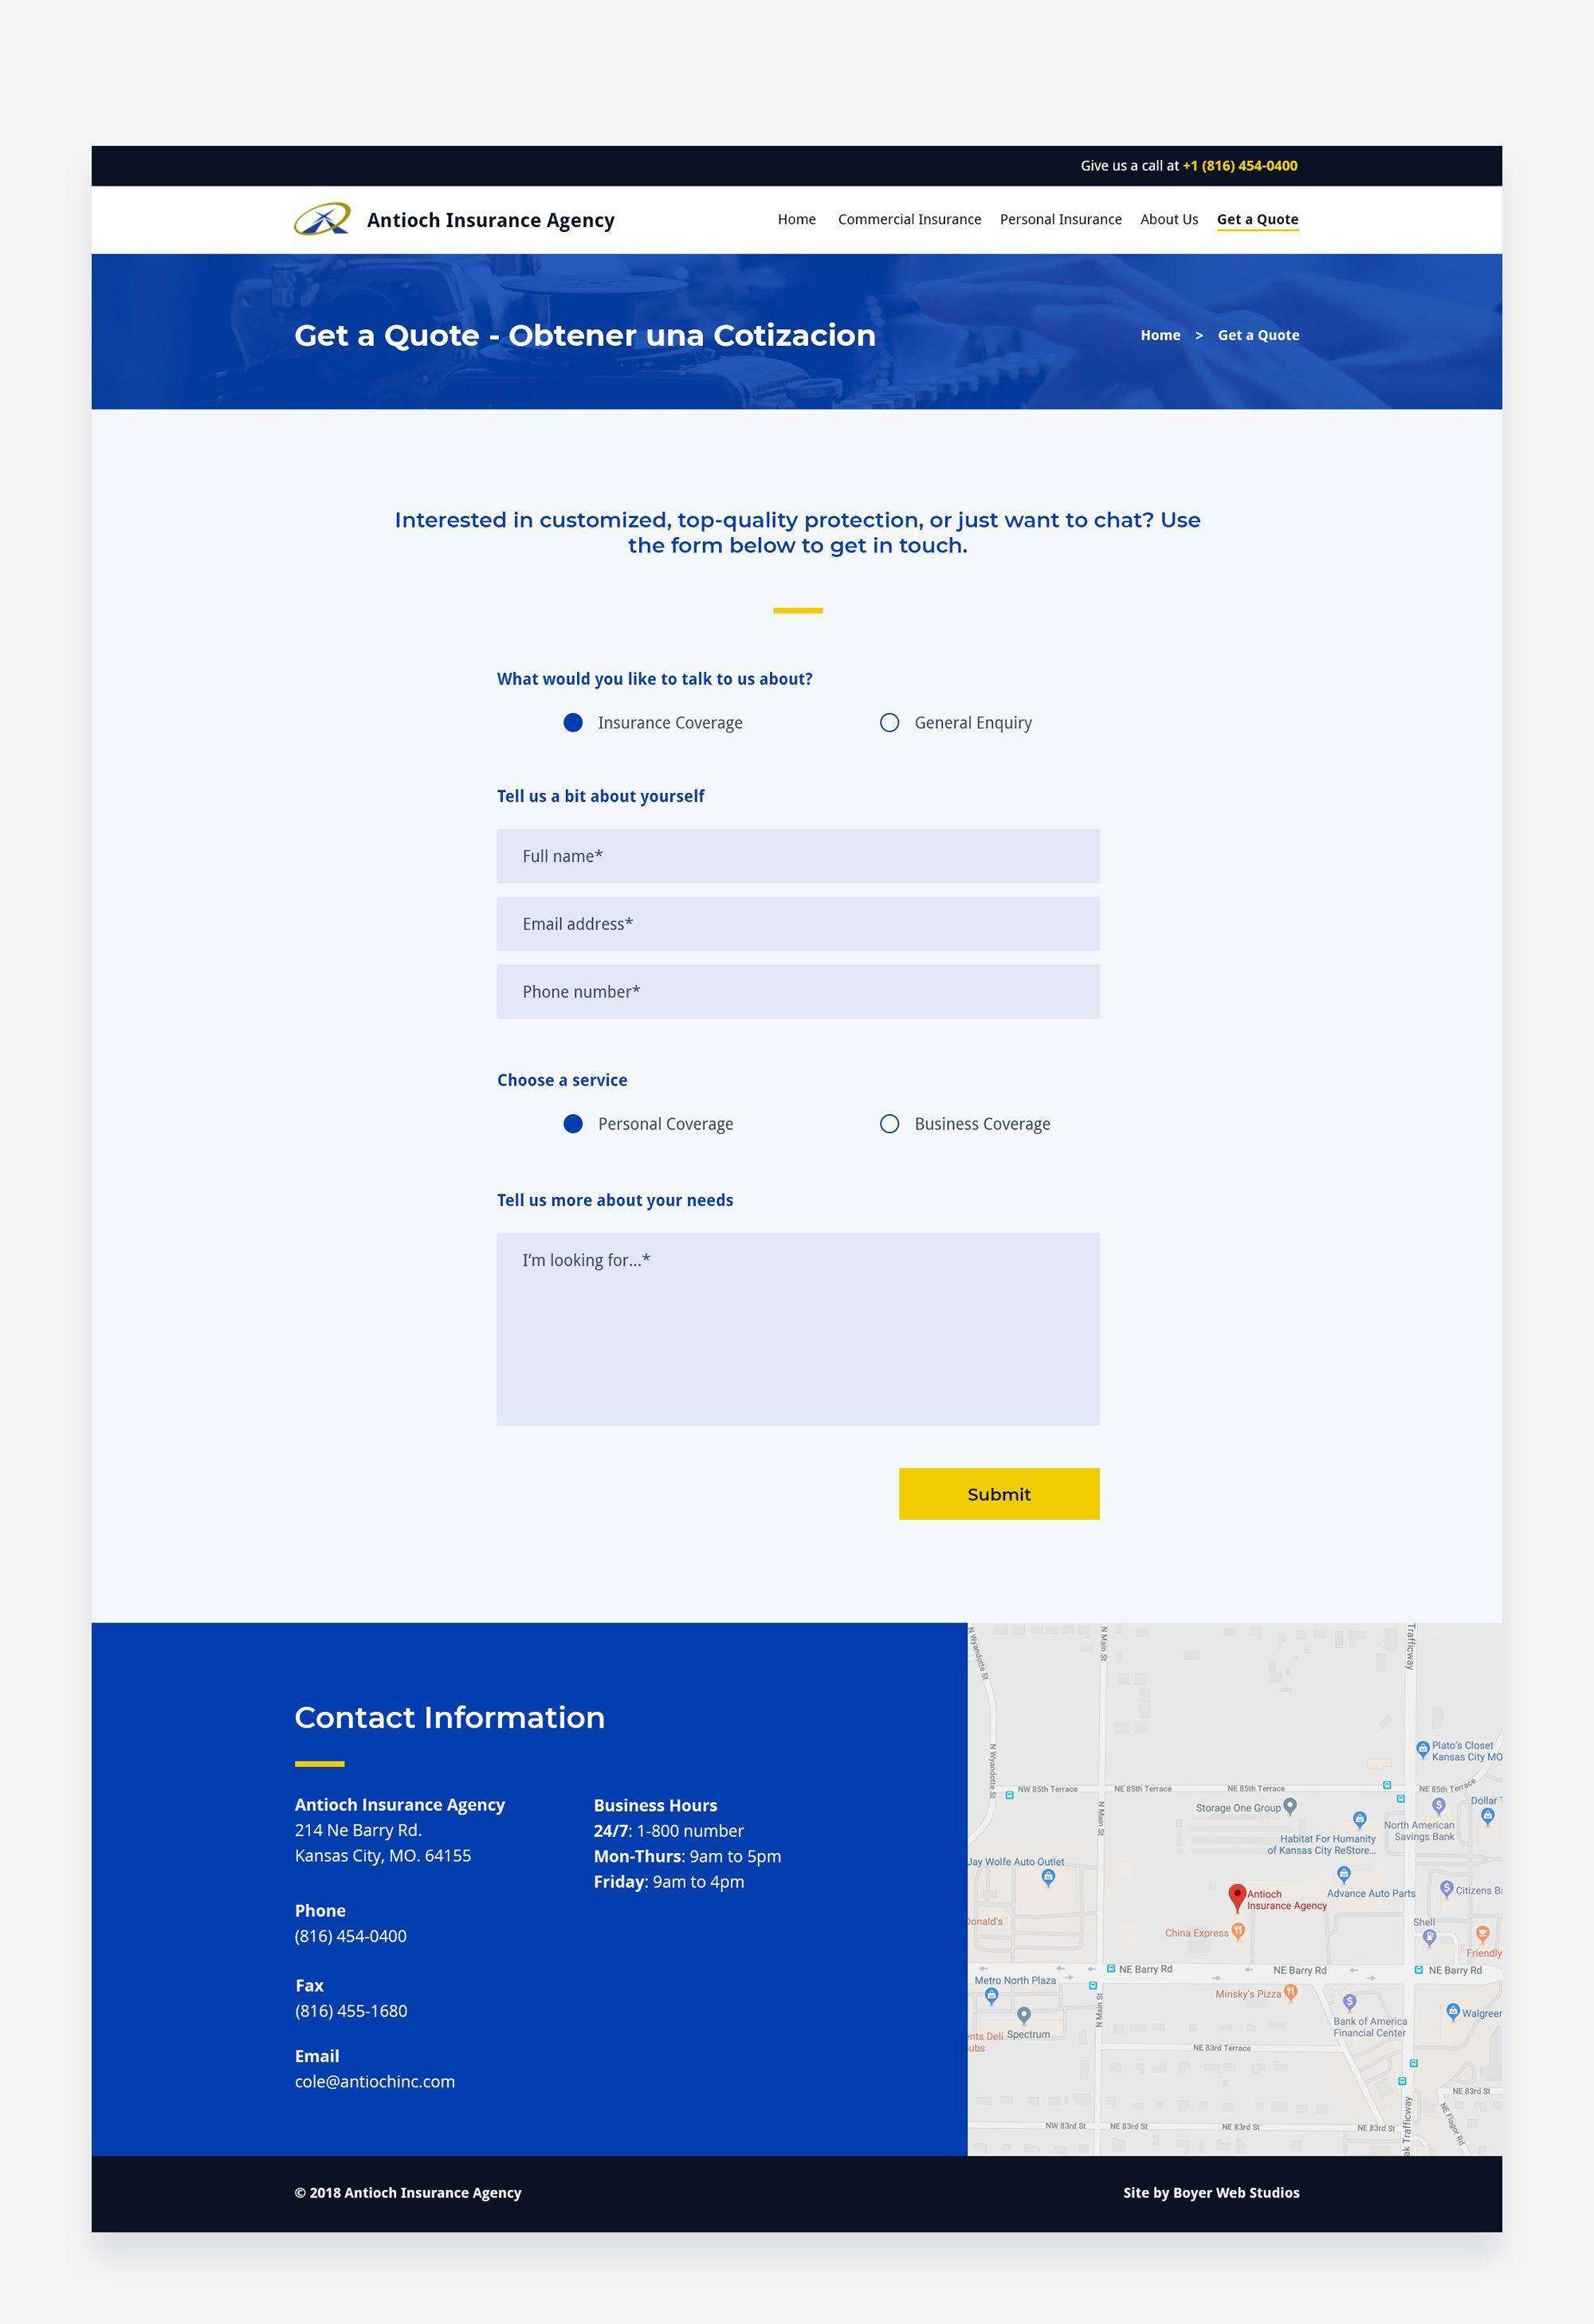 Antioch Insurance Contact